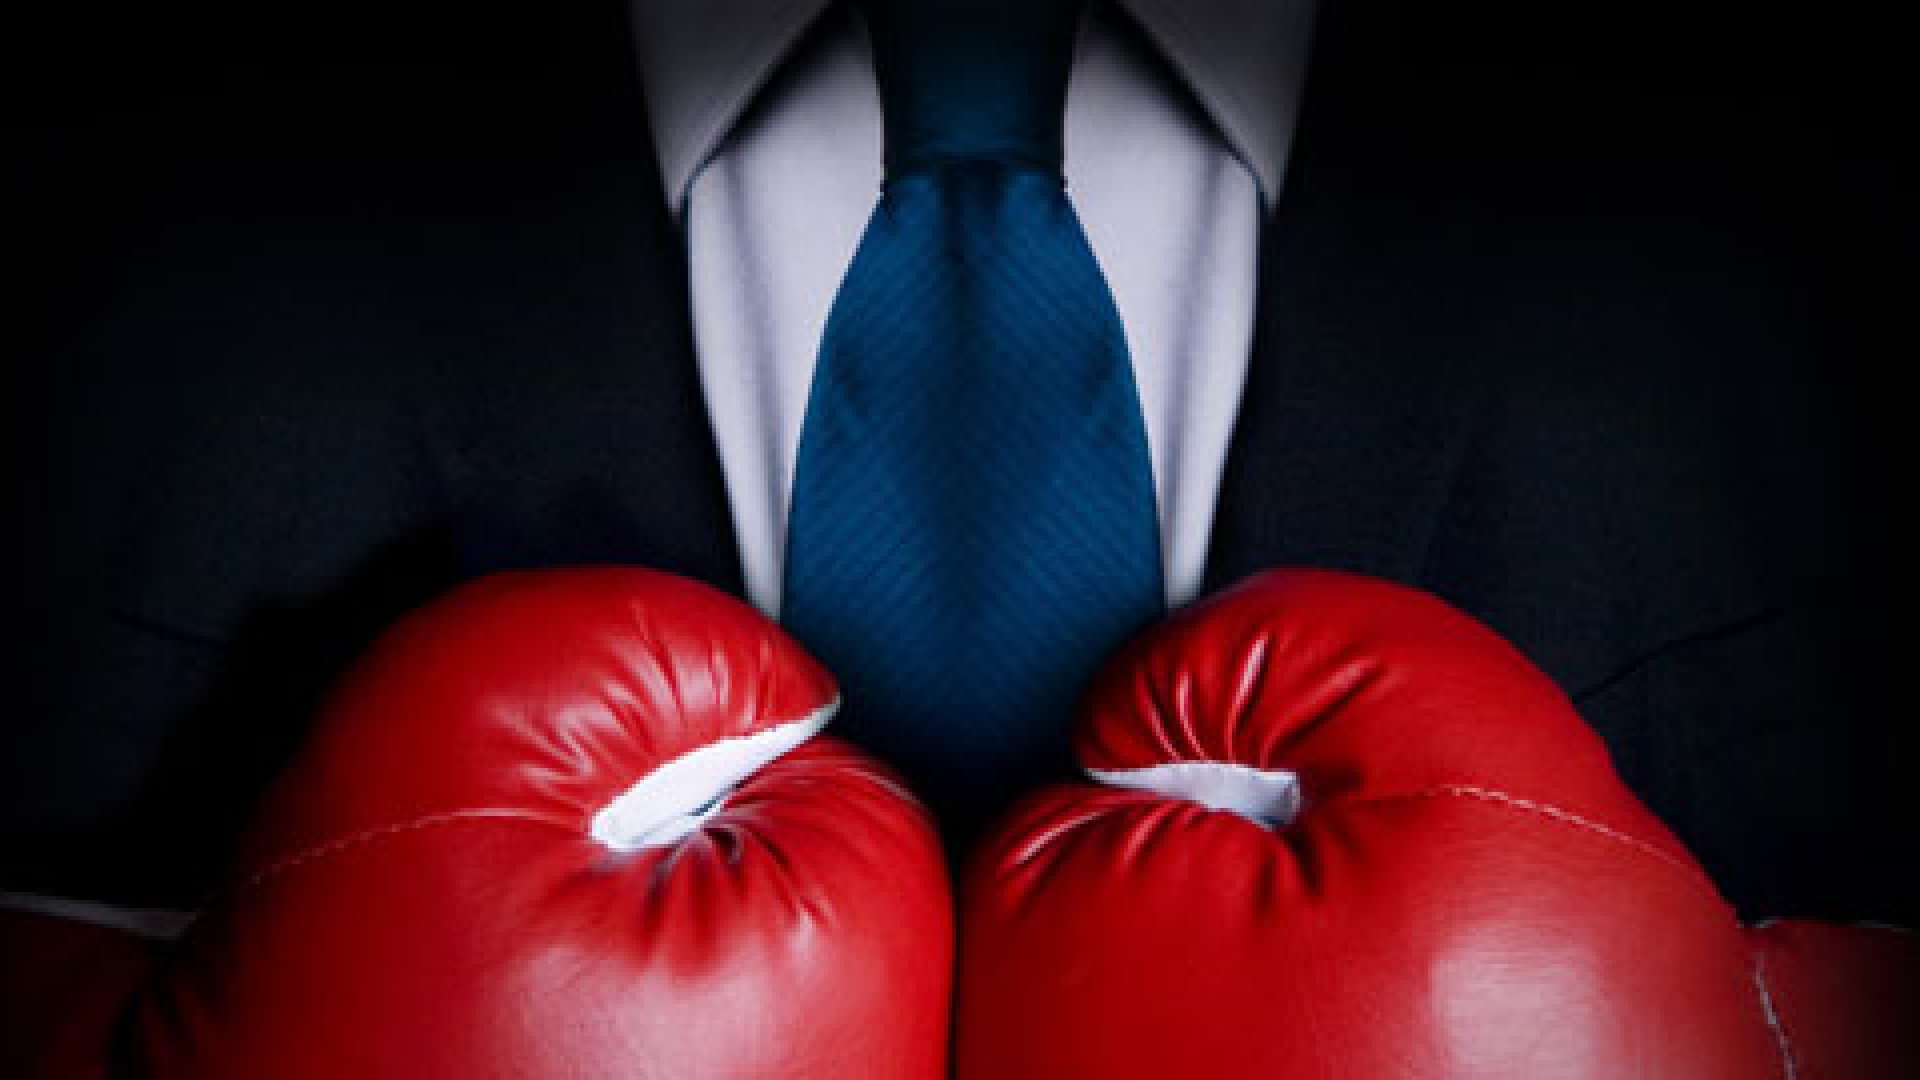 3 Secrets of Constructive Conflict Resolution